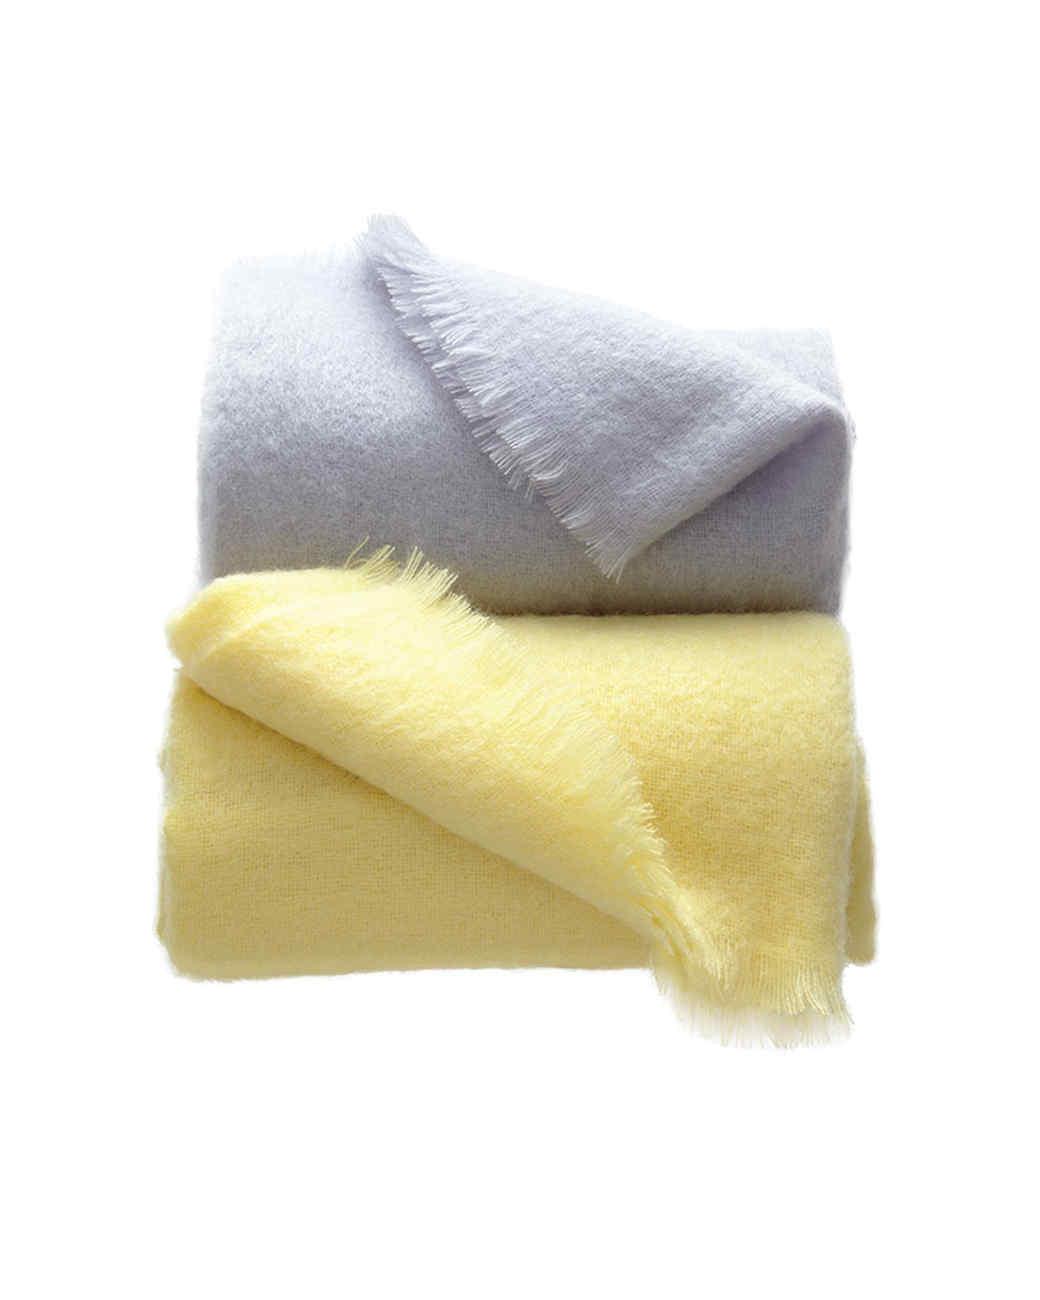 mld106811_0211_blanketa2.jpg